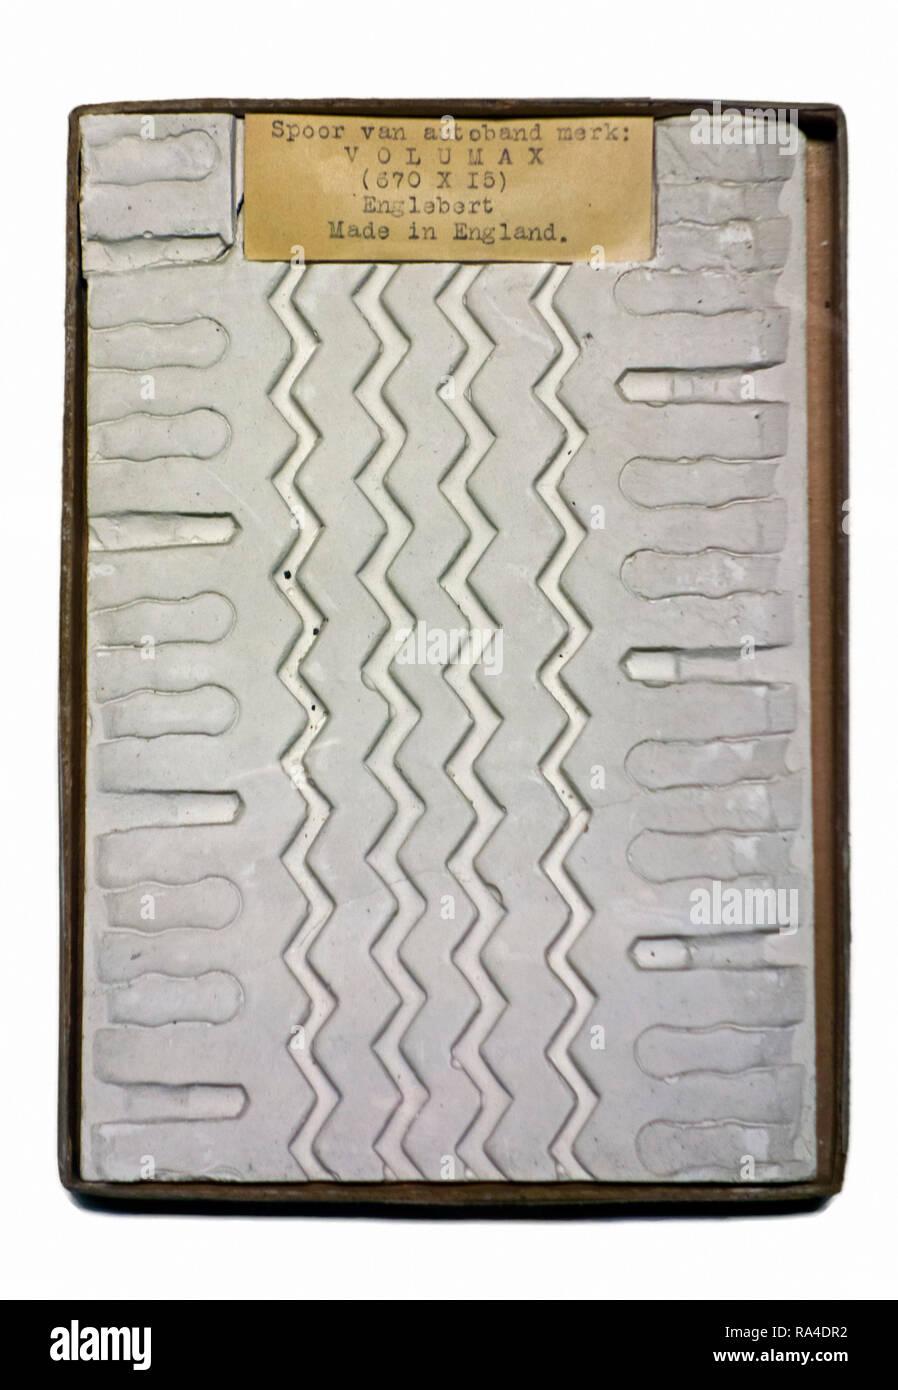 Plaster cast of tread pattern of car tyre / tire taken at crime scene for criminal investigation - Stock Image